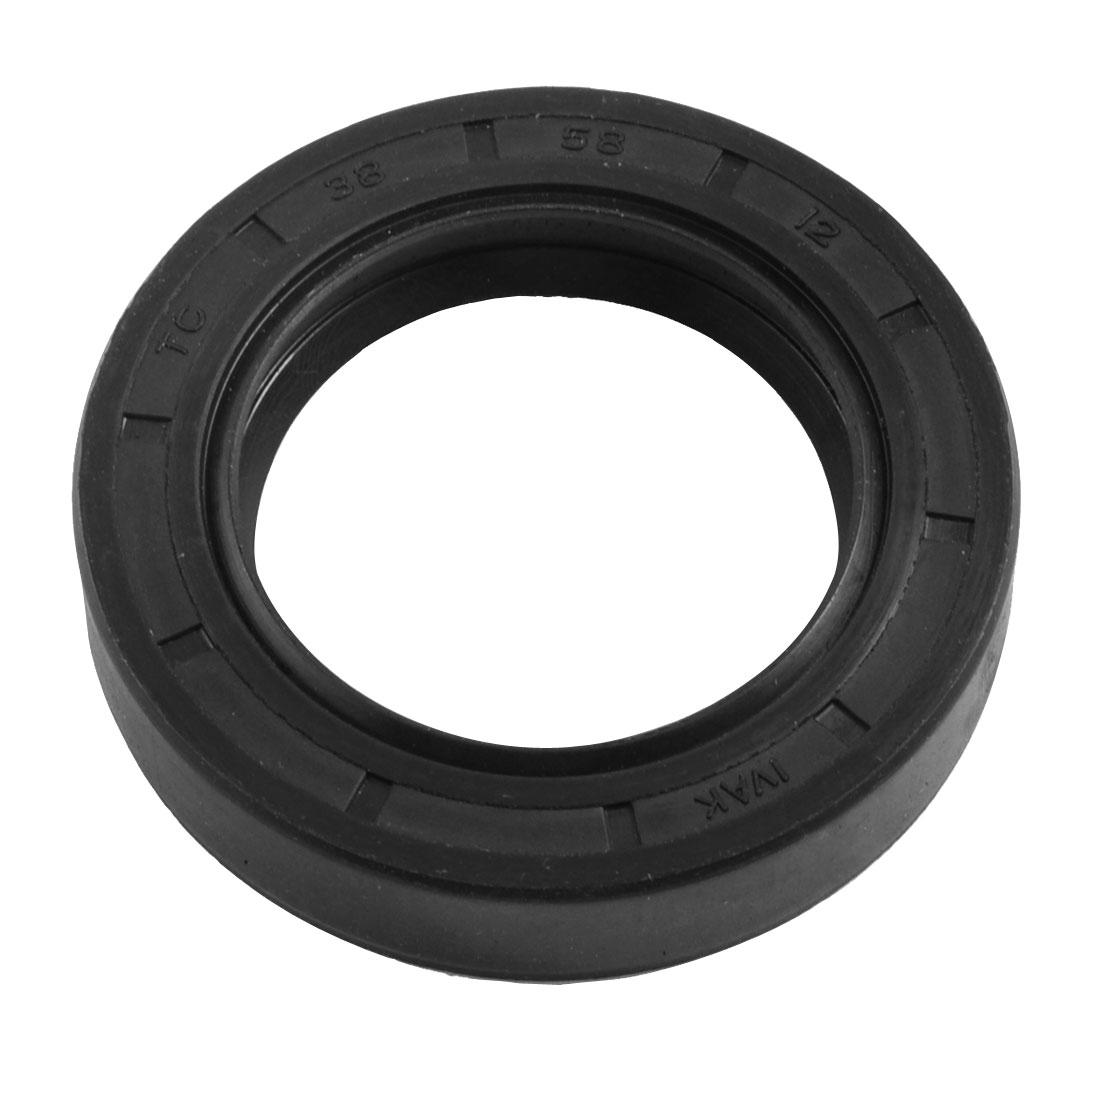 Black-Nitrile-Rubber-Dual-Lips-Oil-Shaft-Seal-TC-38mm-x-58mm-x-12mm